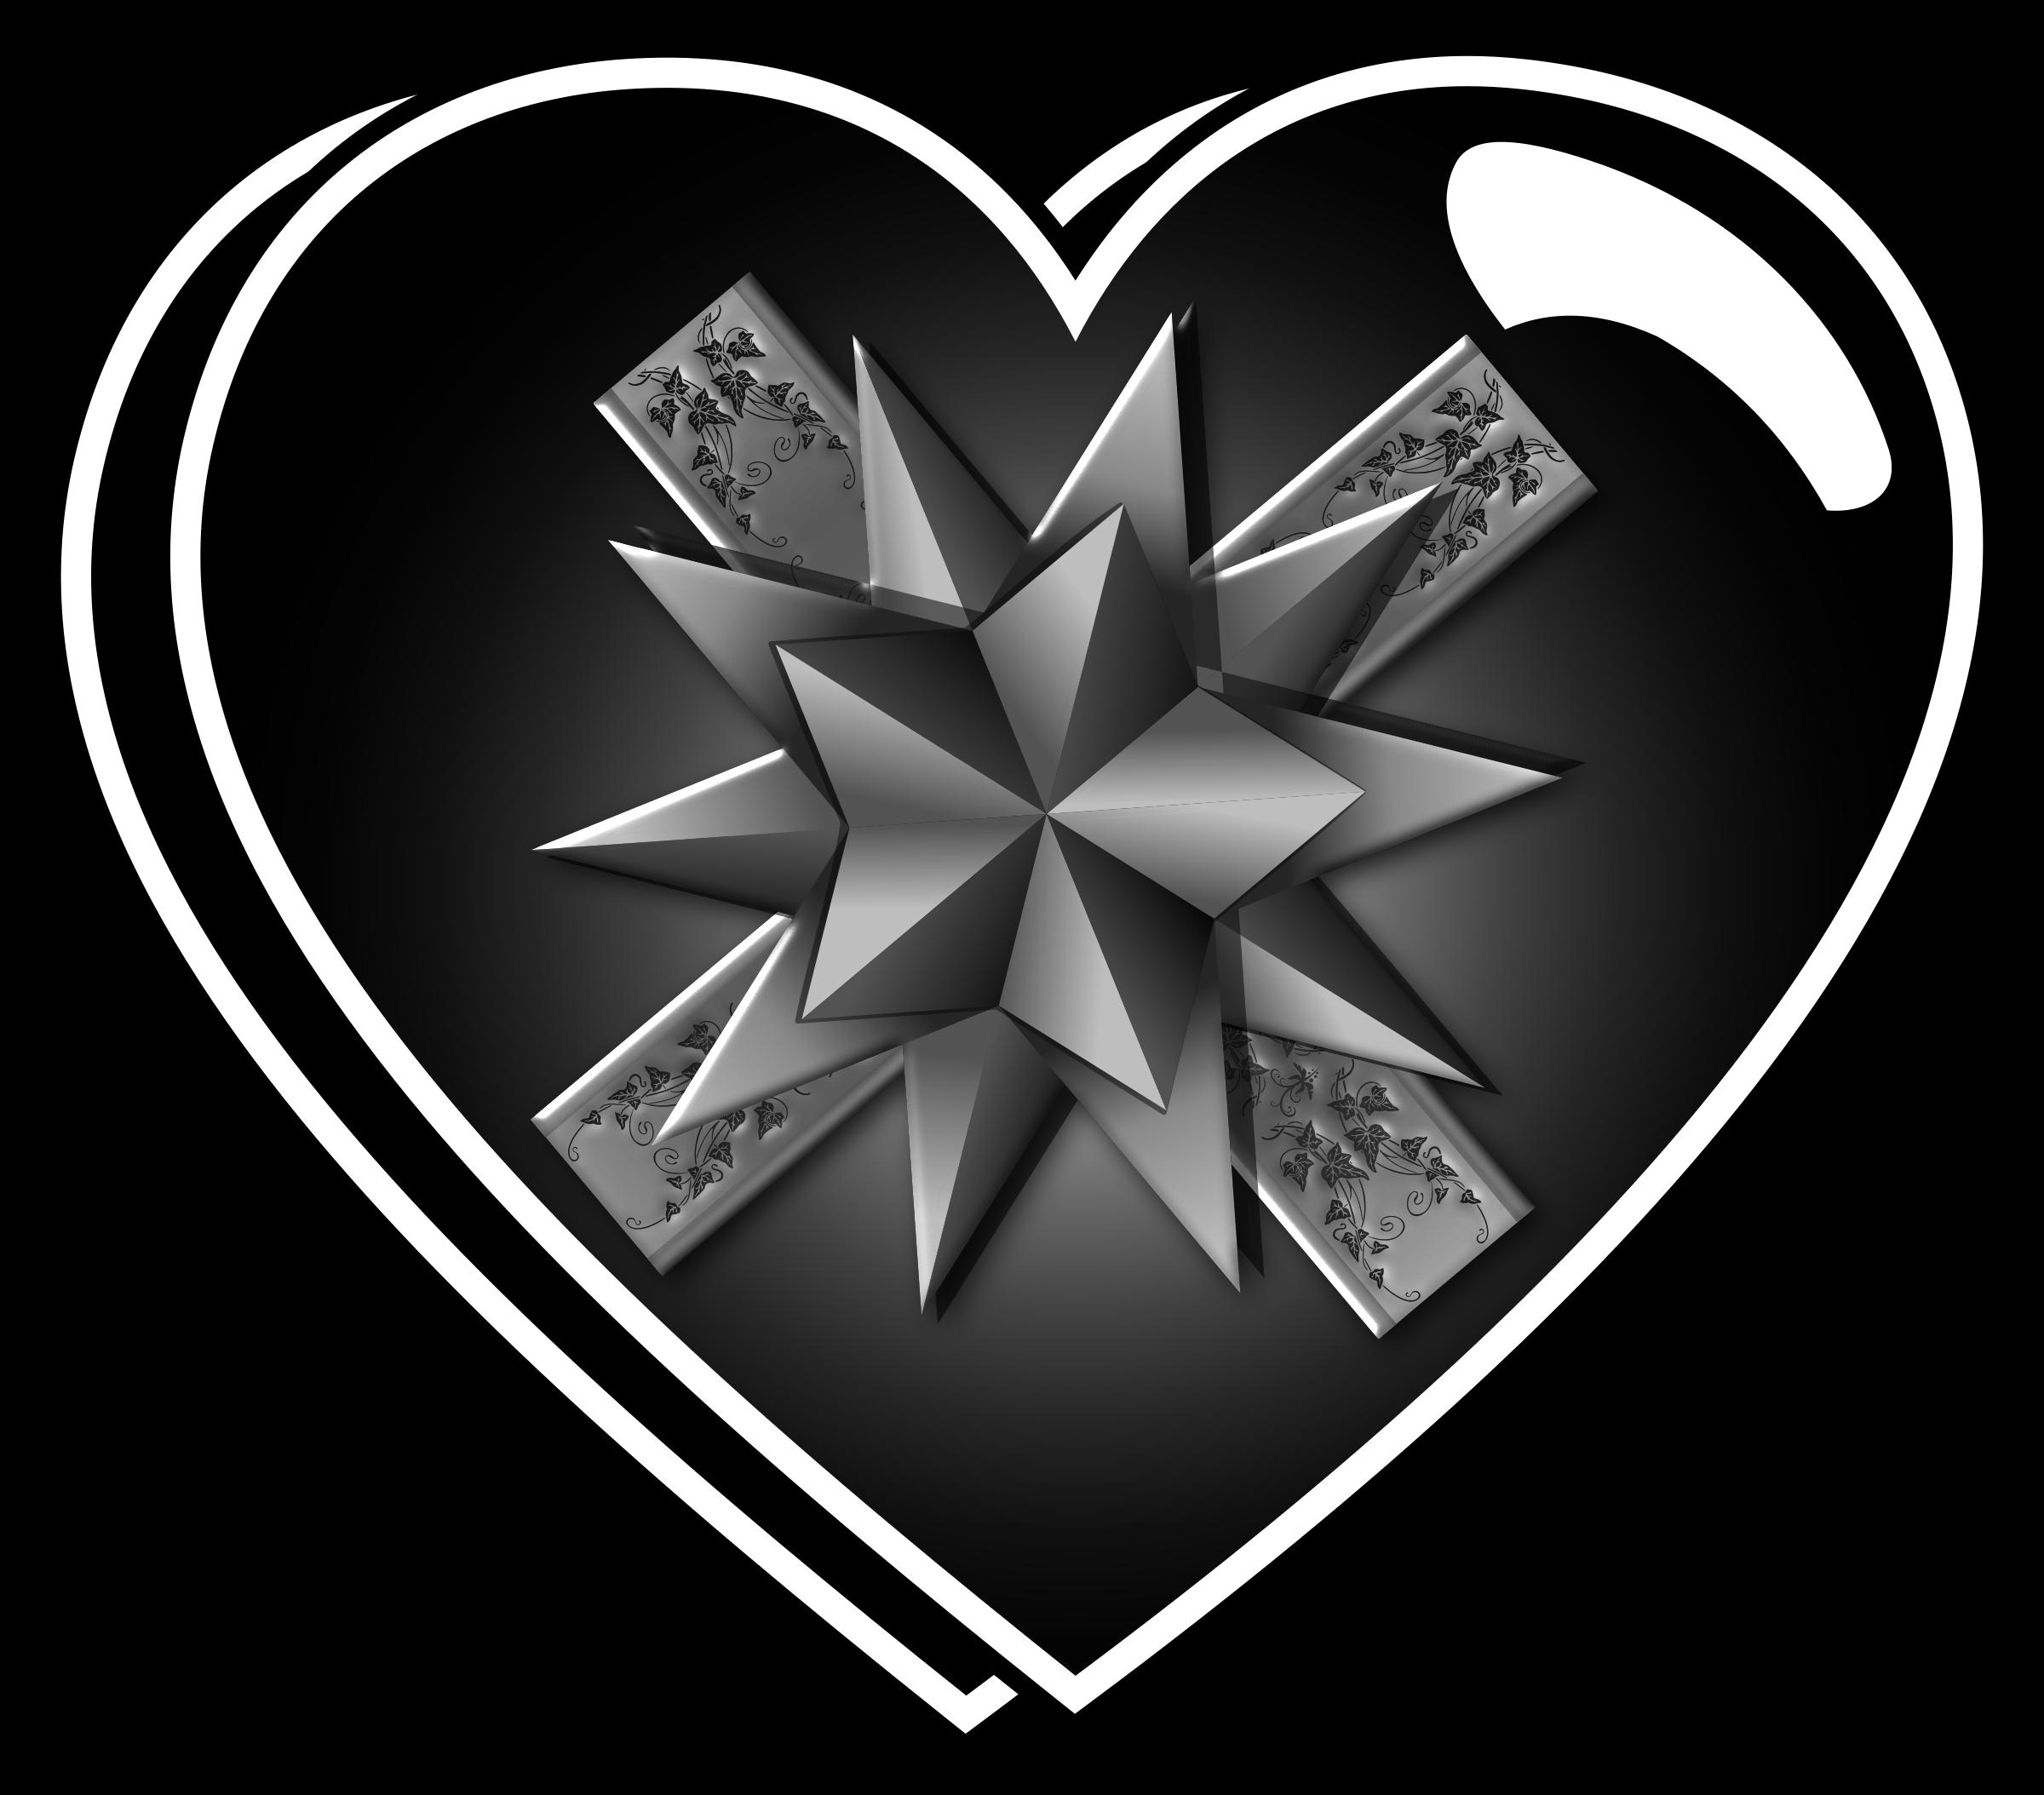 Heart-shaped clipart big IMAGE Heart Clipart Shaped Box